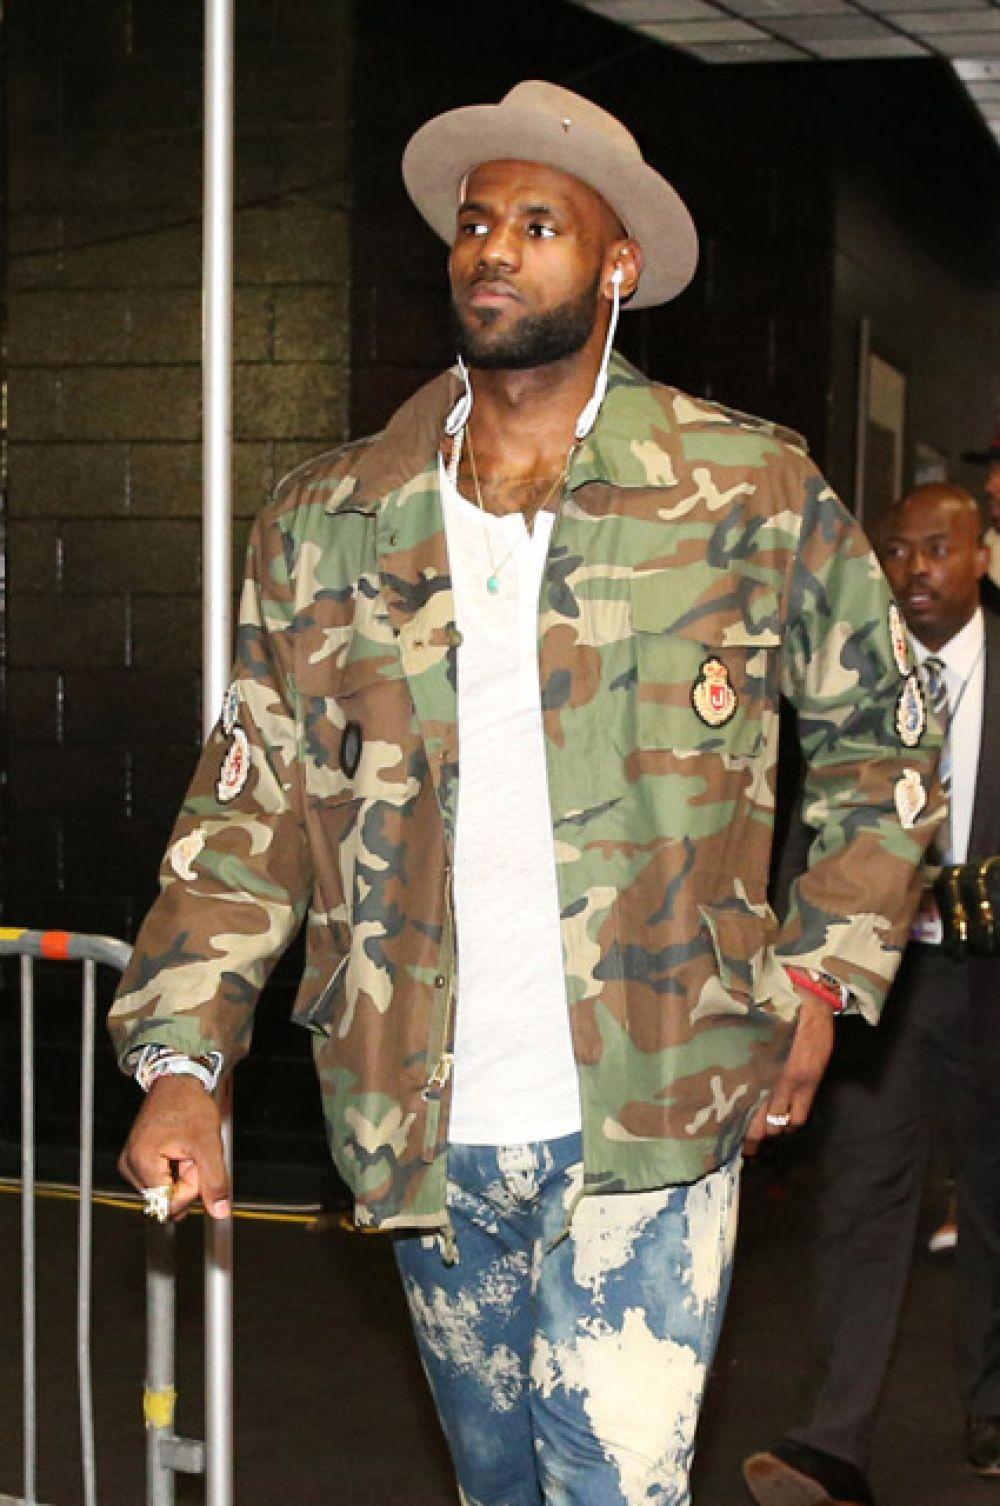 5-е место — баскетболист Леброн Джеймс, играющий на позиции лёгкого и тяжёлого форварда за команду НБА «Кливленд Кавальерс».